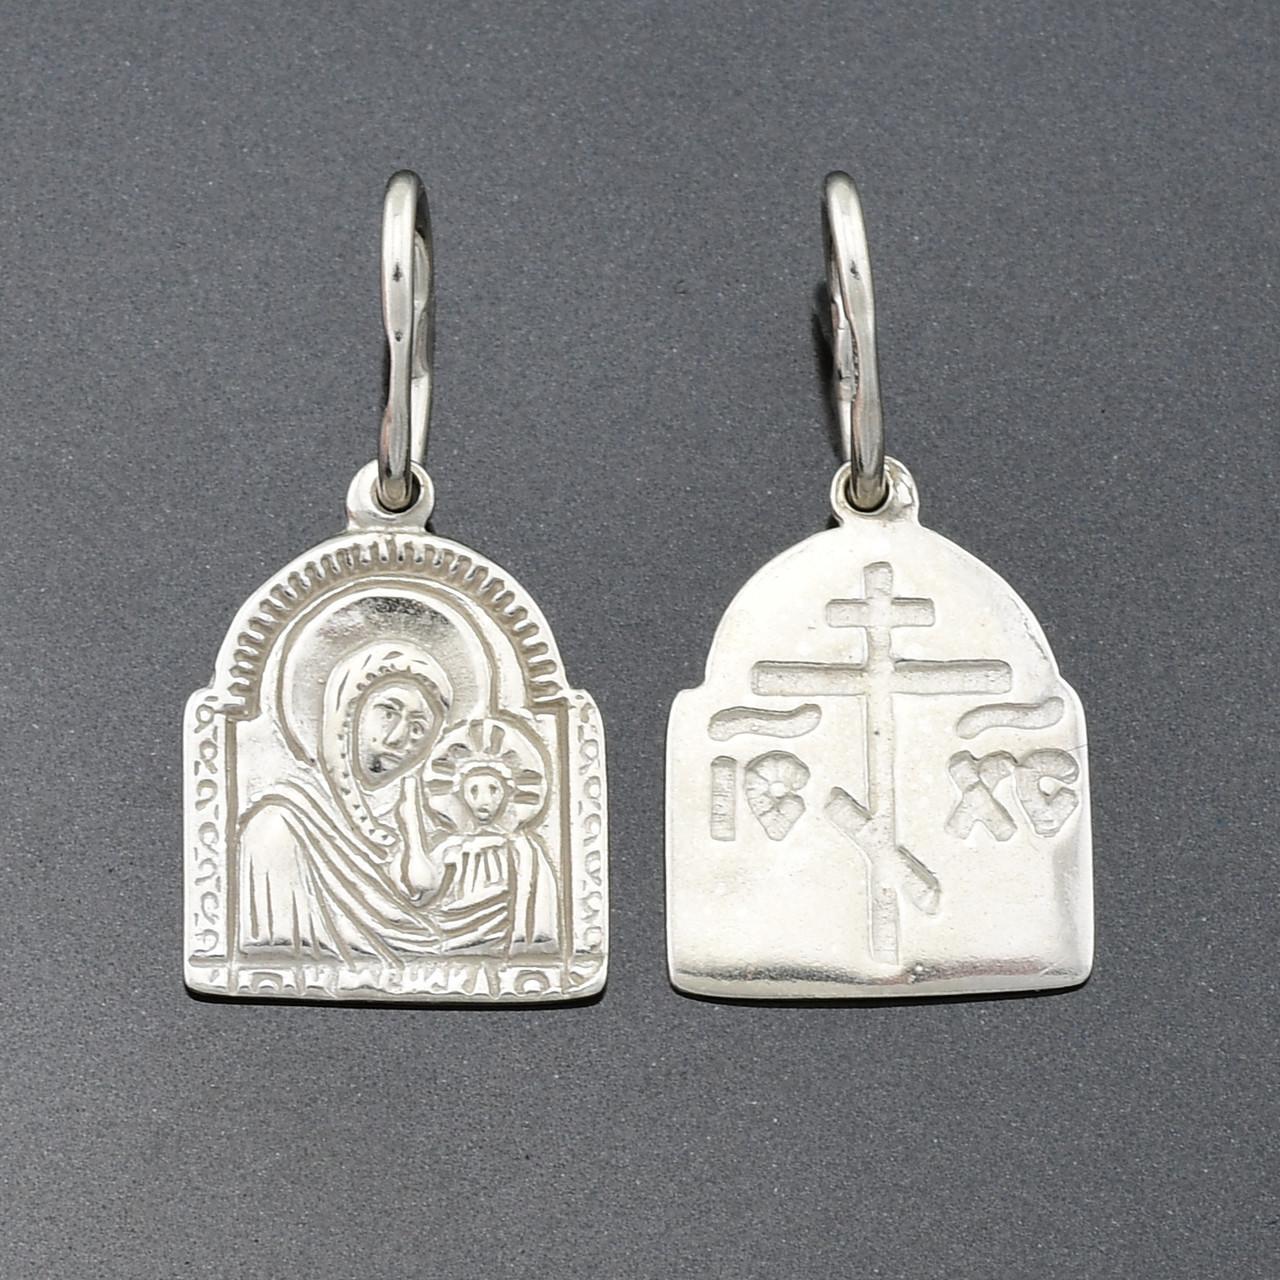 Серебряная иконка Богородица размер 22х11 мм вес серебра 0.88 г